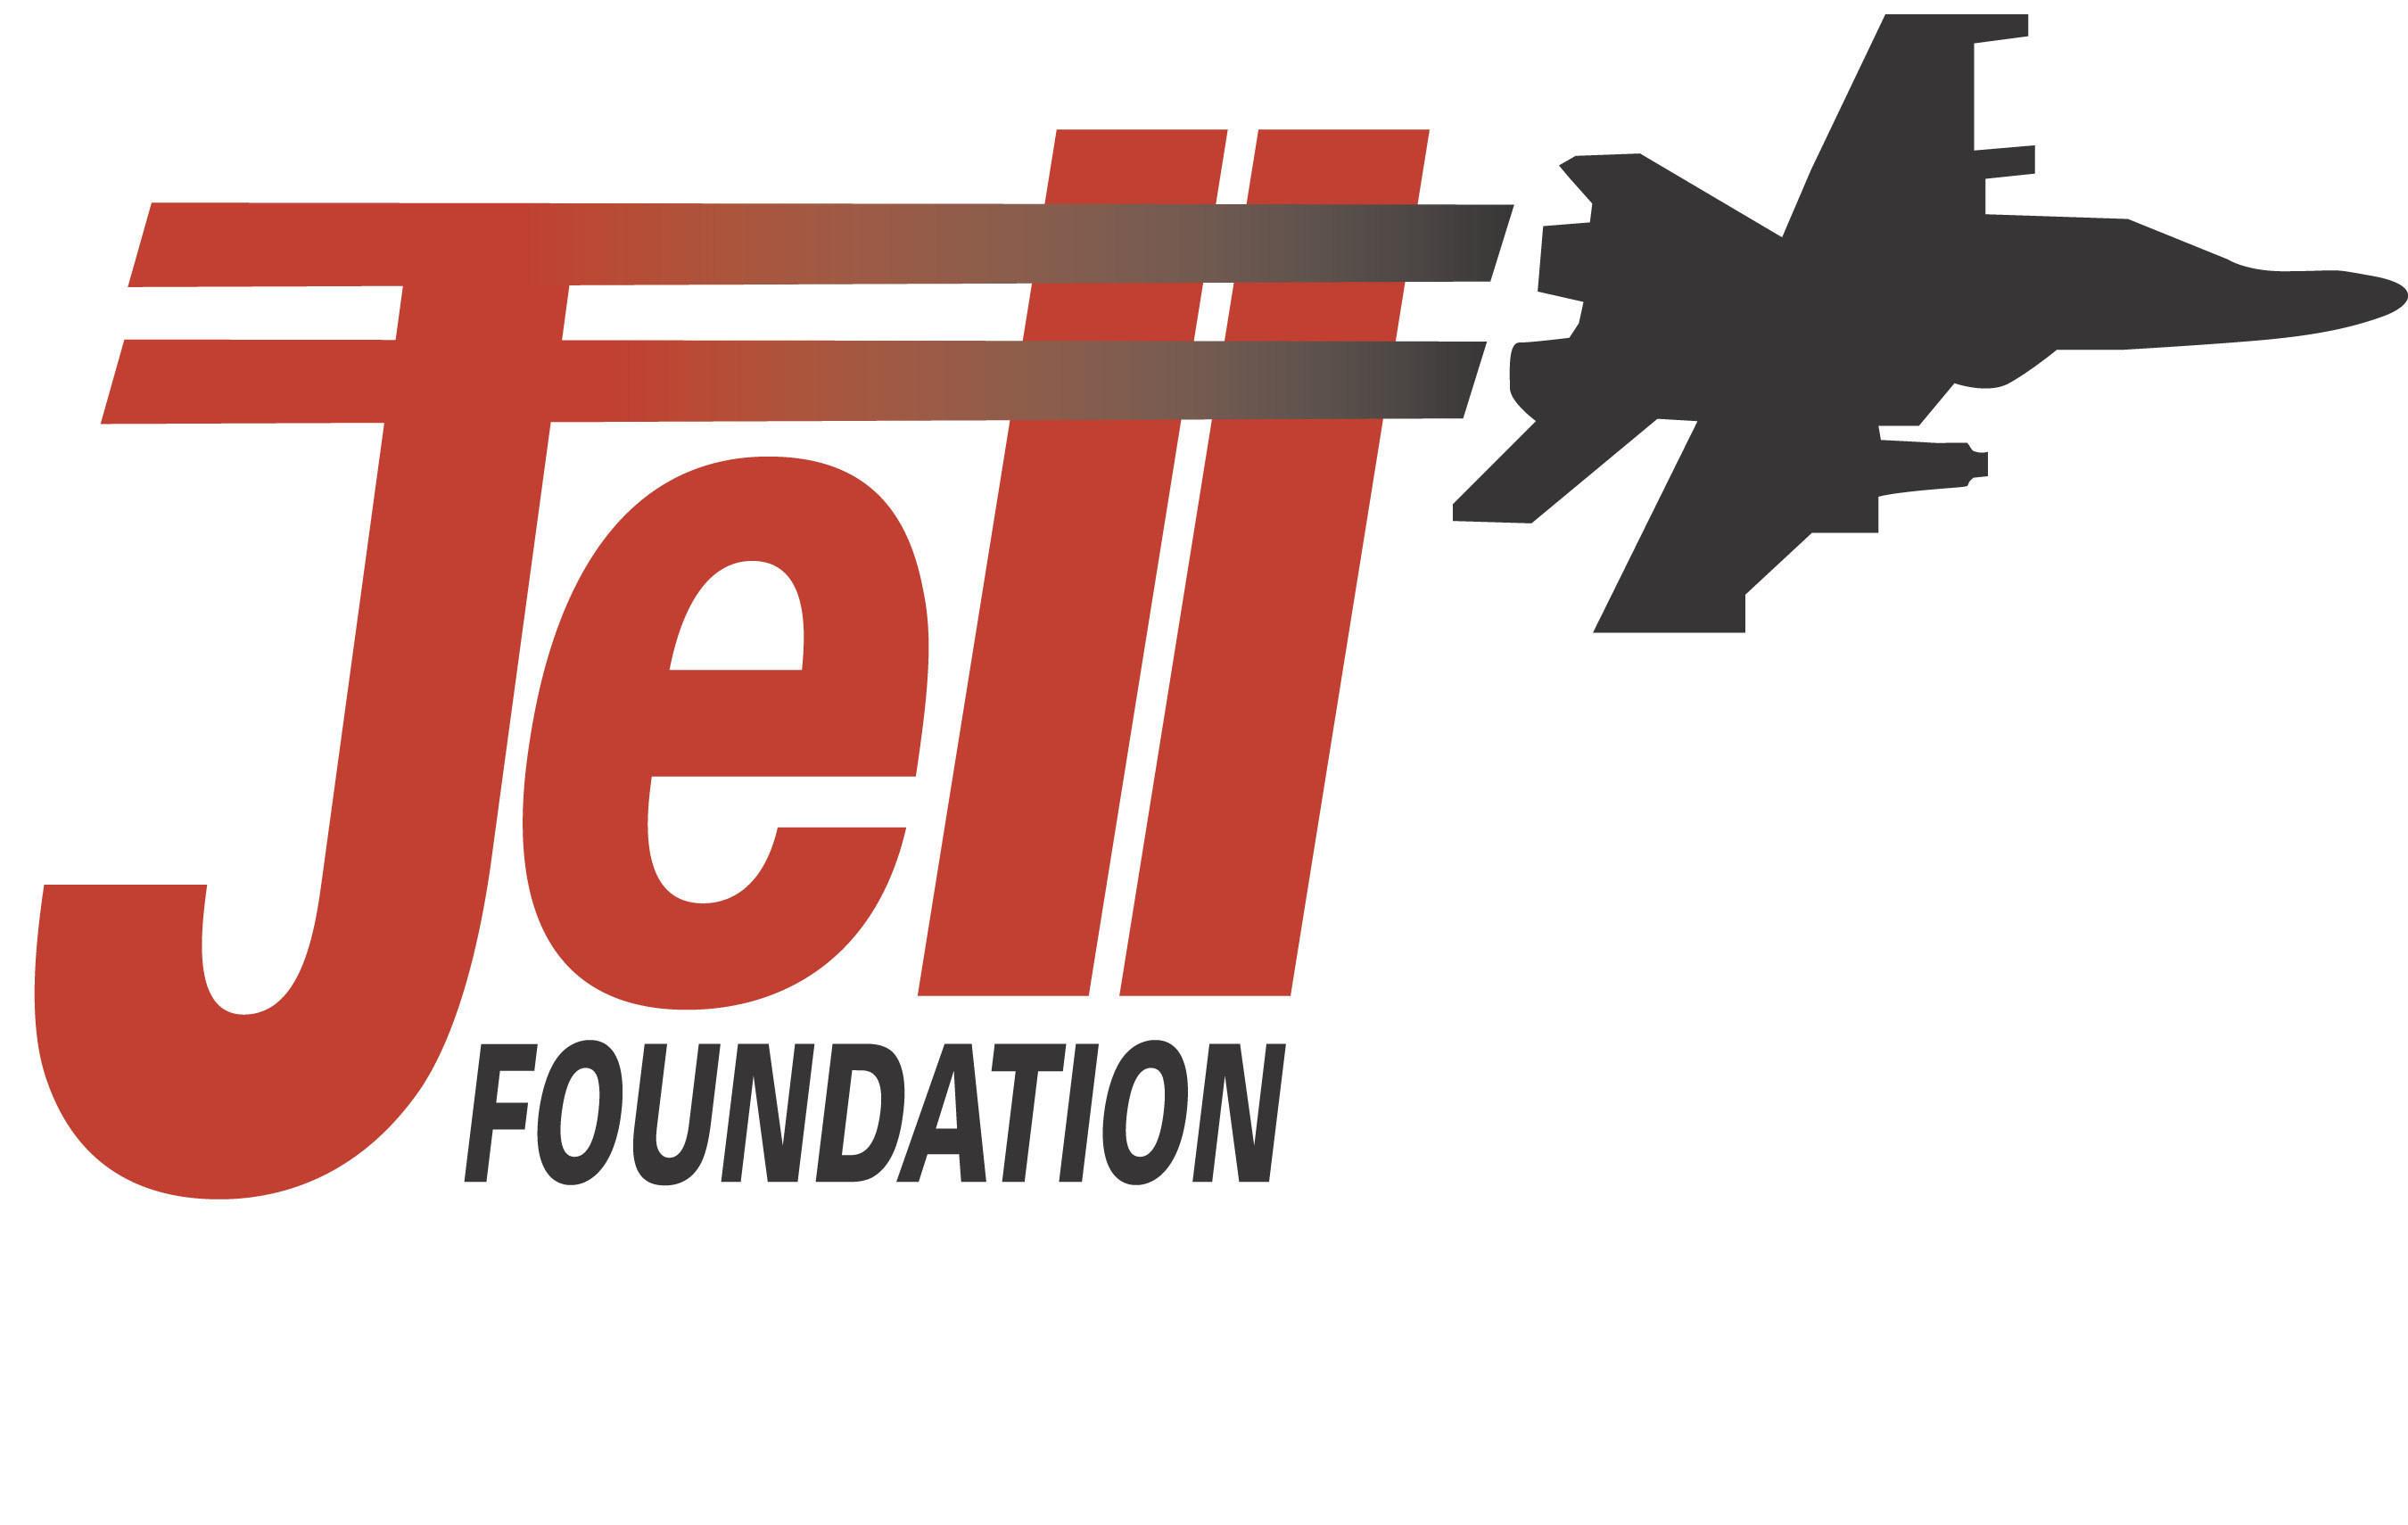 The Jett Foundation